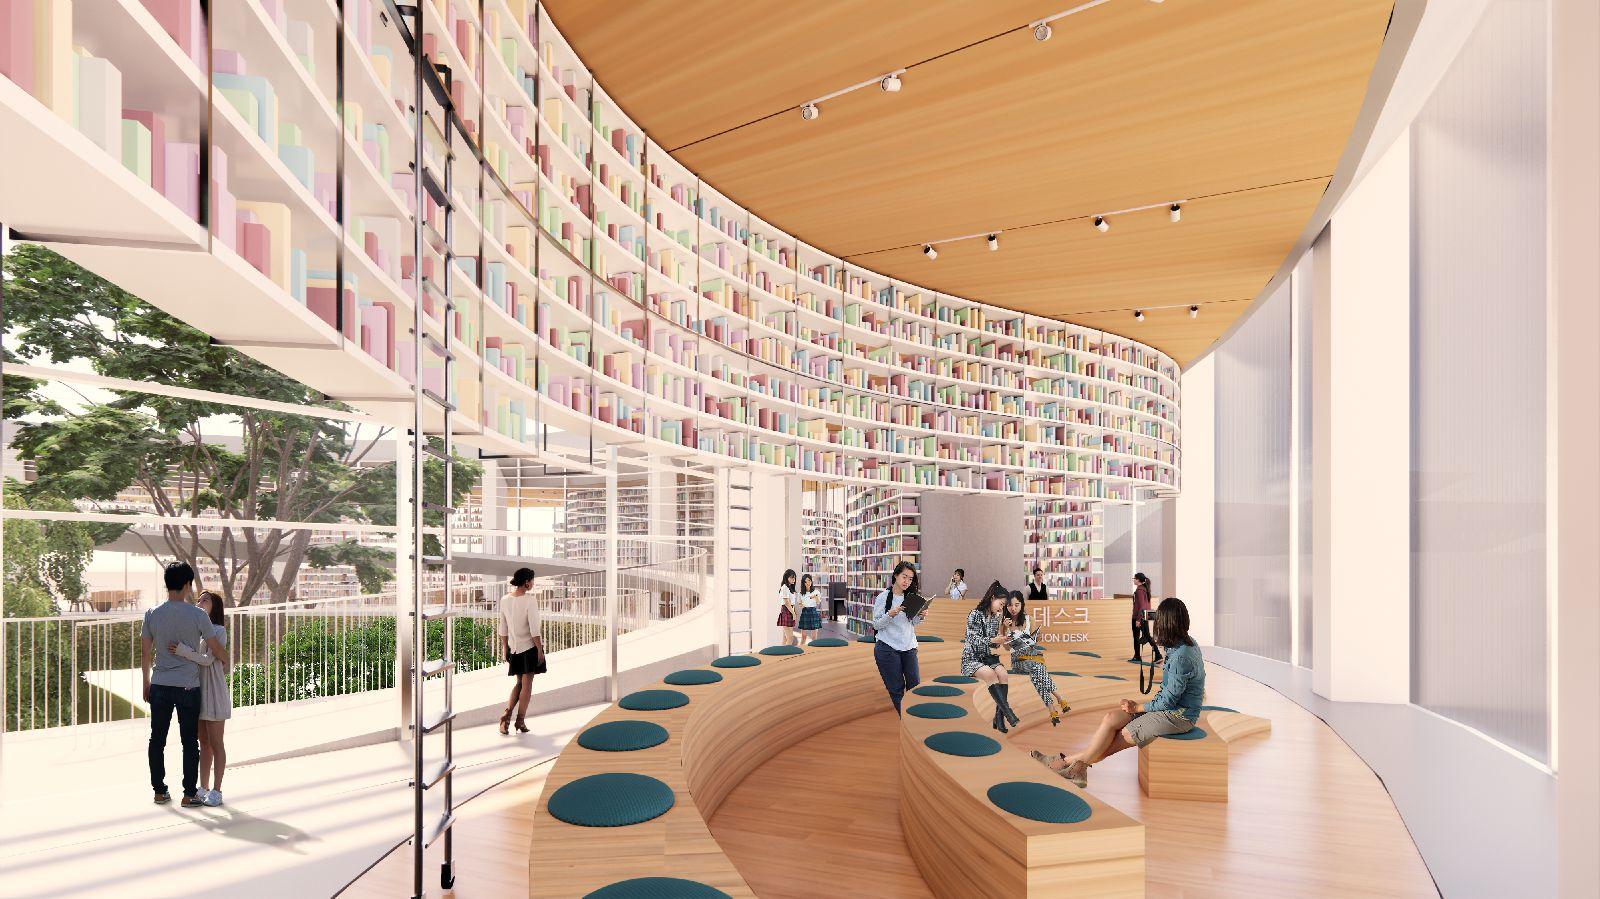 Songdo International Library